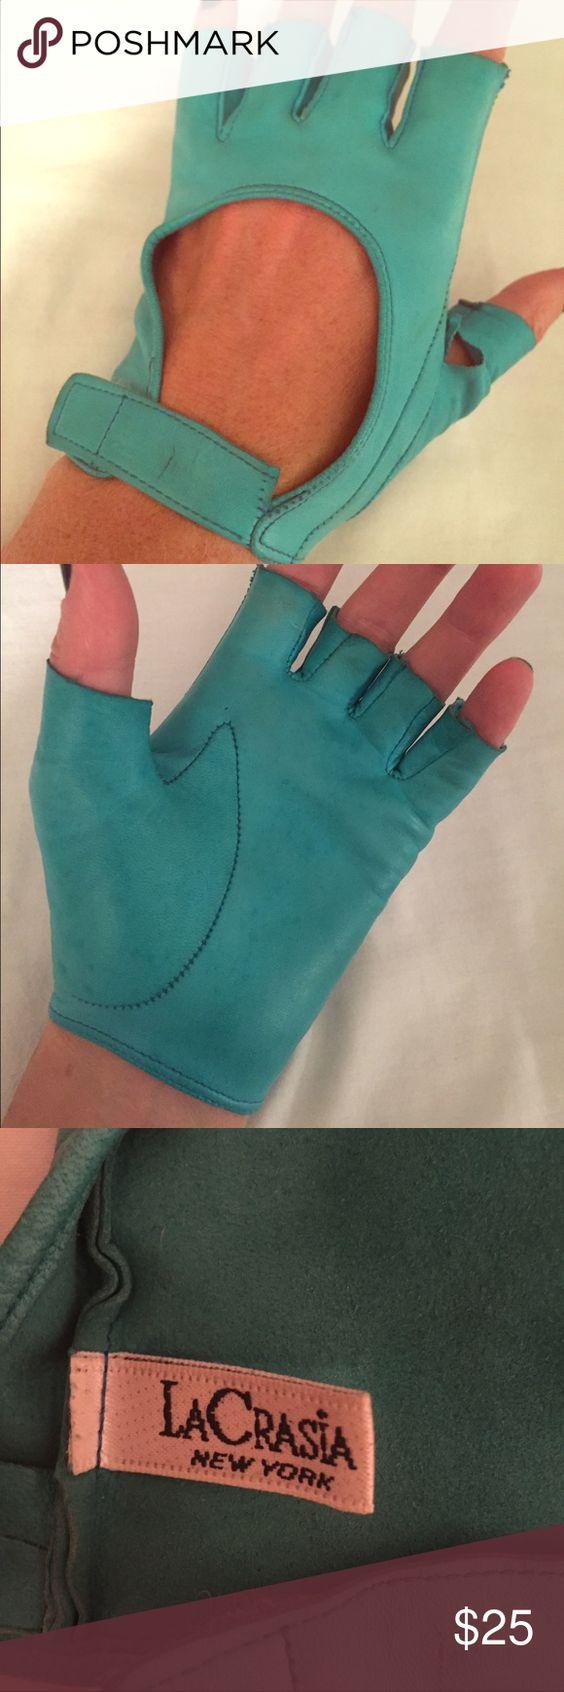 Blue leather driving gloves - Designer Turquoise Leather Driving Gloves Designer La Crasia Turquoise Leather Driving Gloves Small Tear In